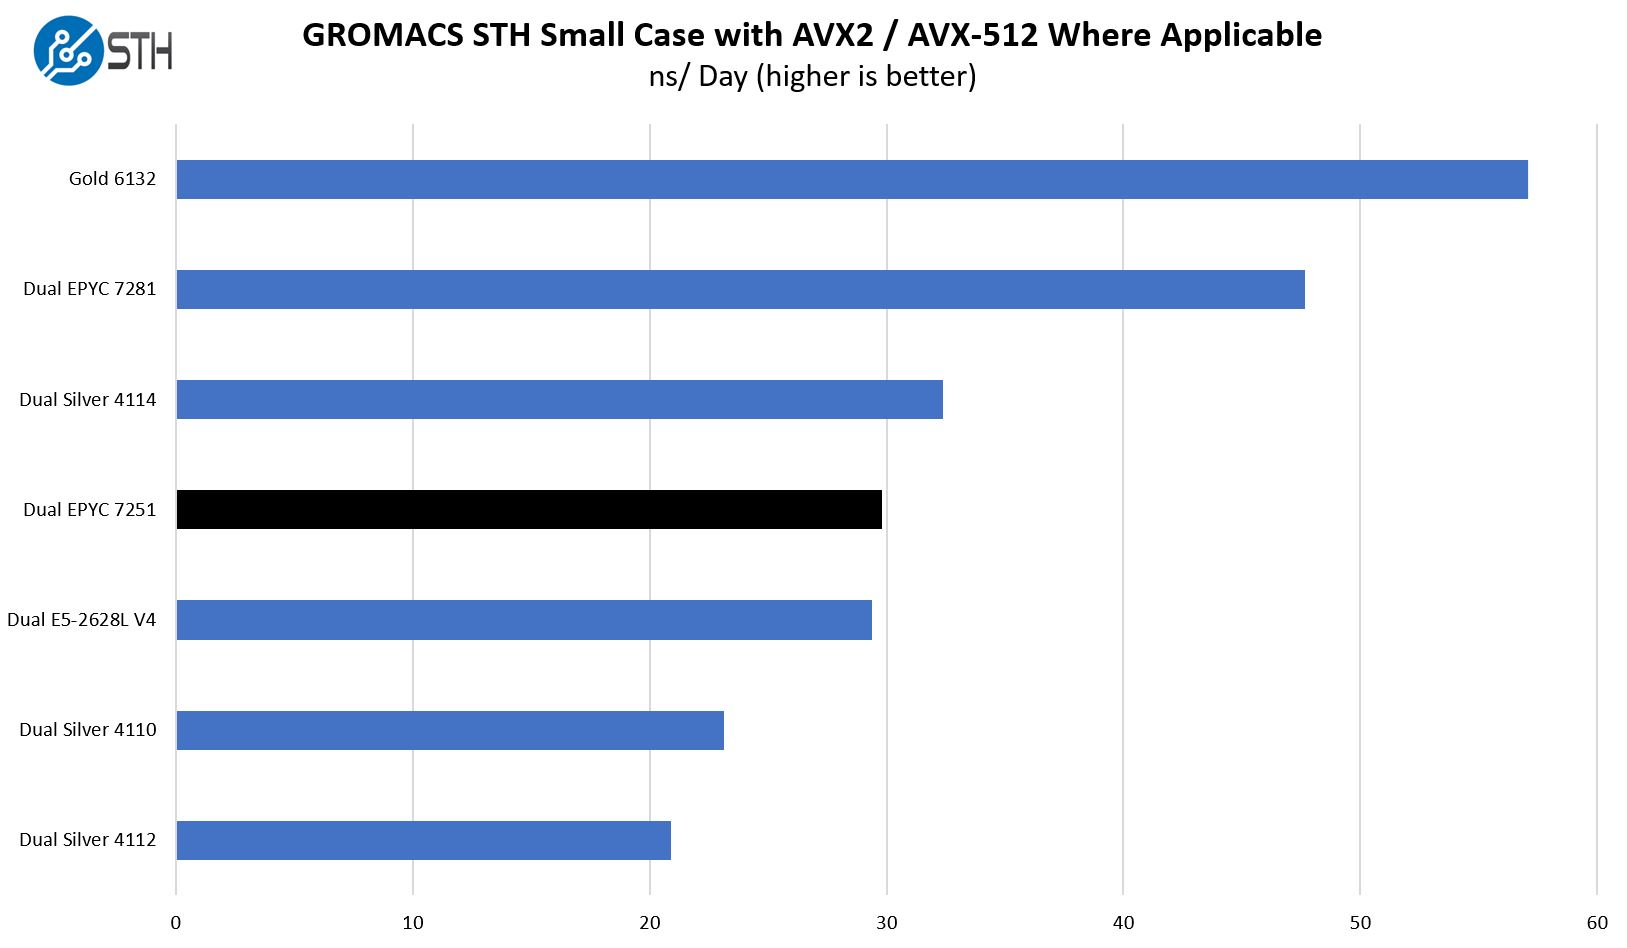 Dual AMD EPYC 7251 GROMACS Small